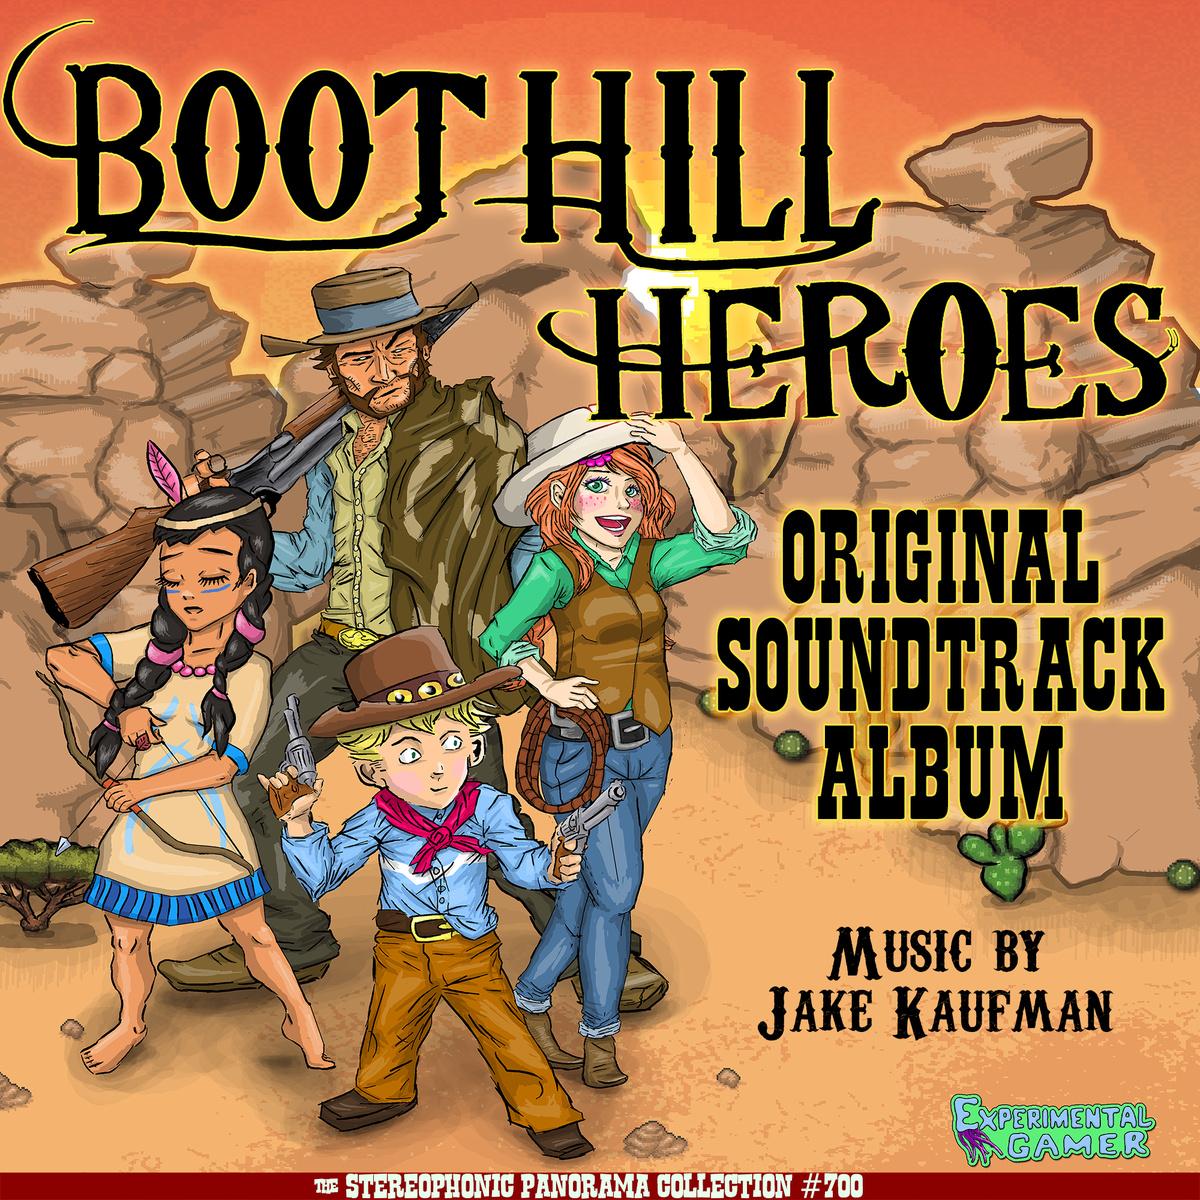 boothillheroes